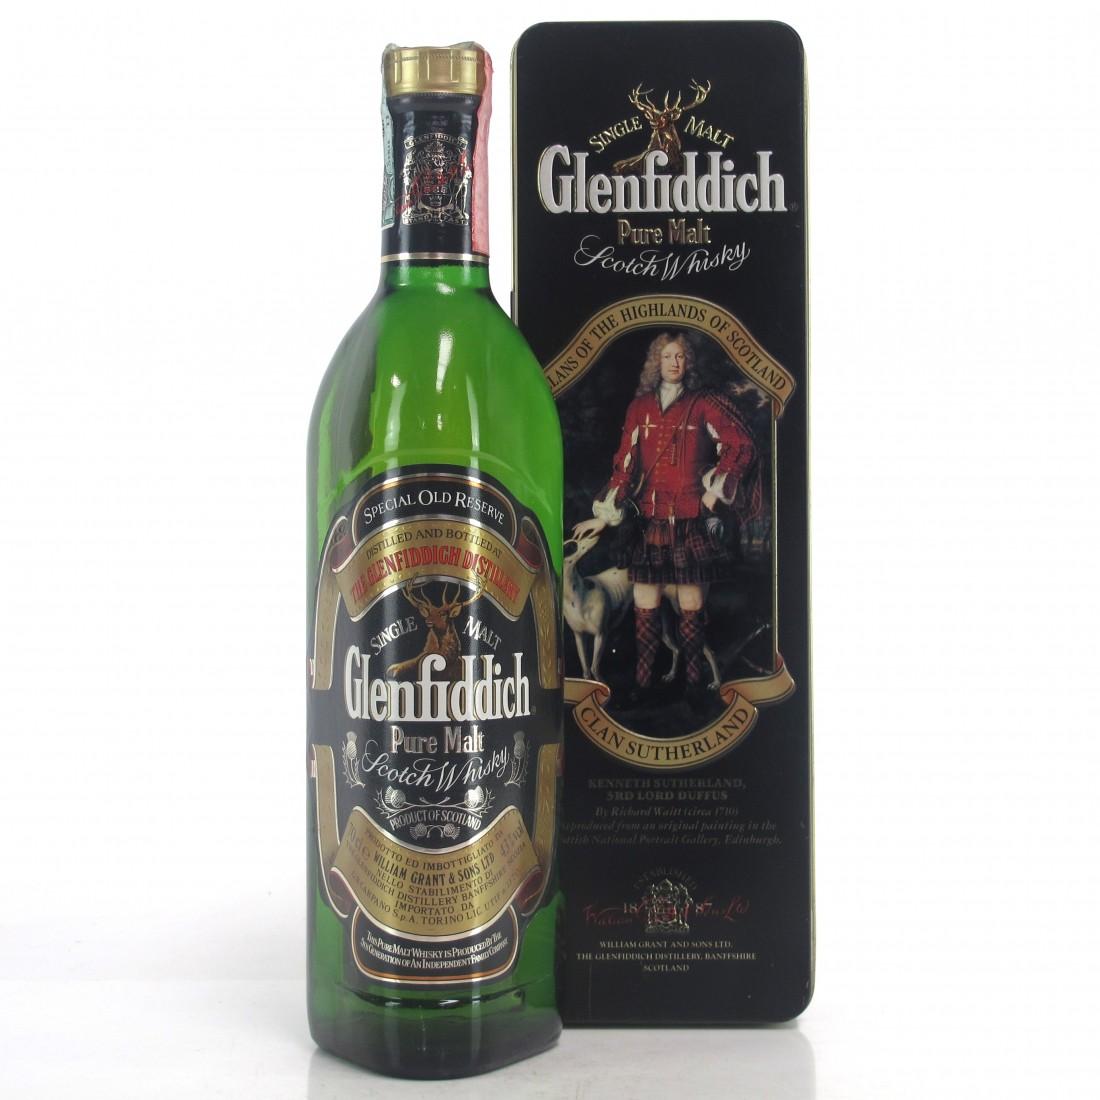 Glenfiddich Clans of the Highland / Clan Sutherland